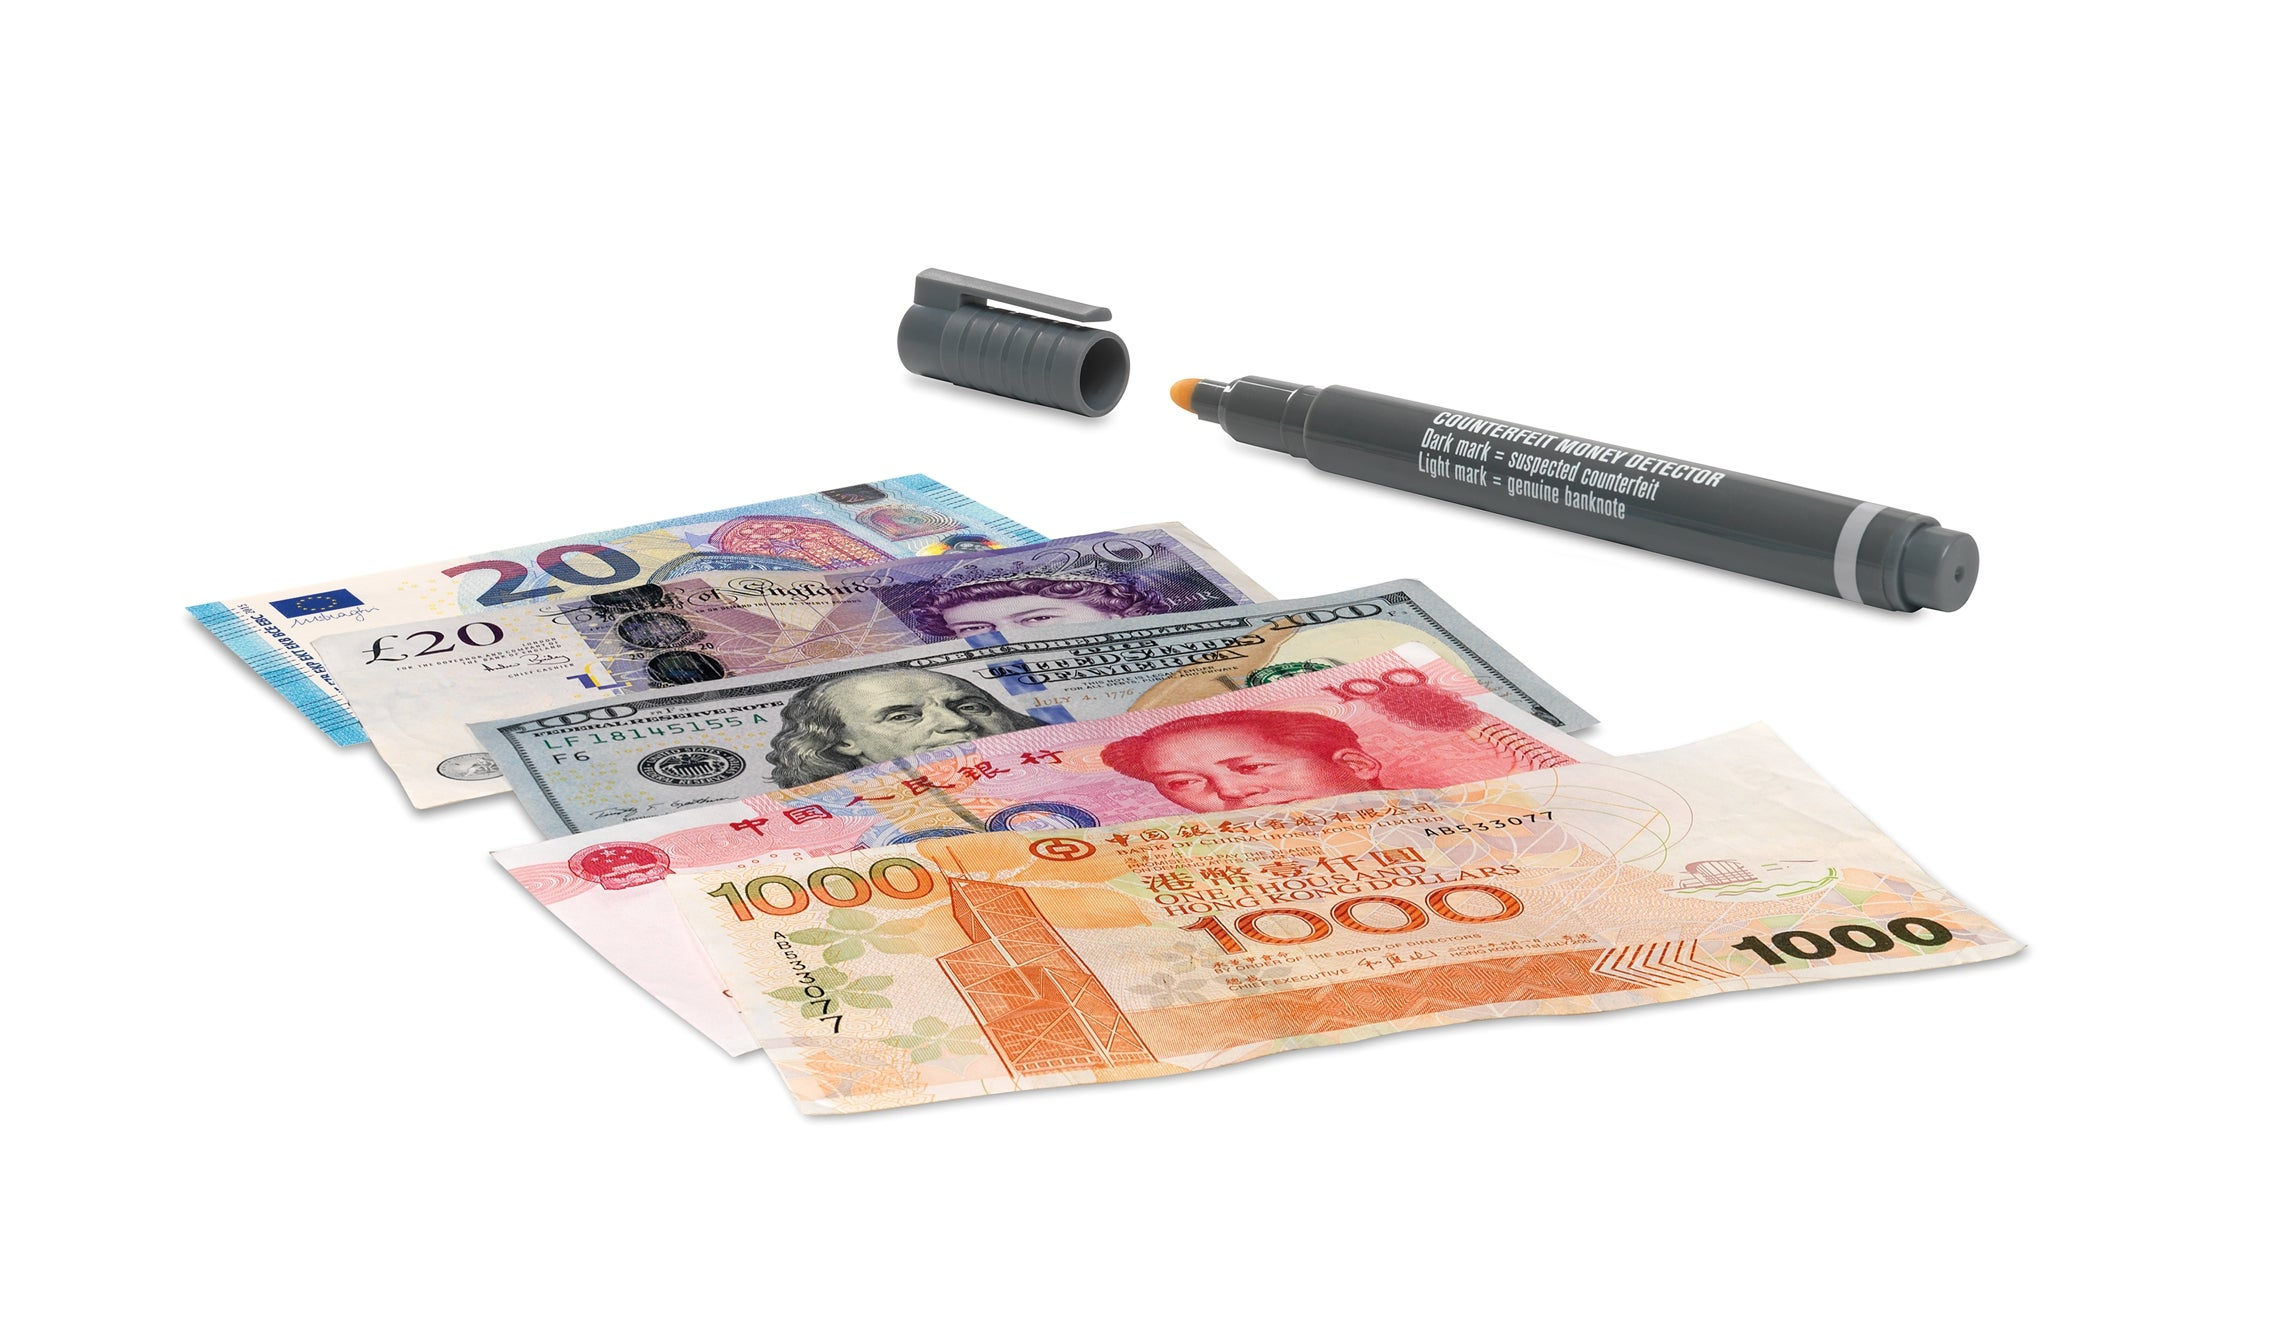 safescan-30-counterfeit-pen